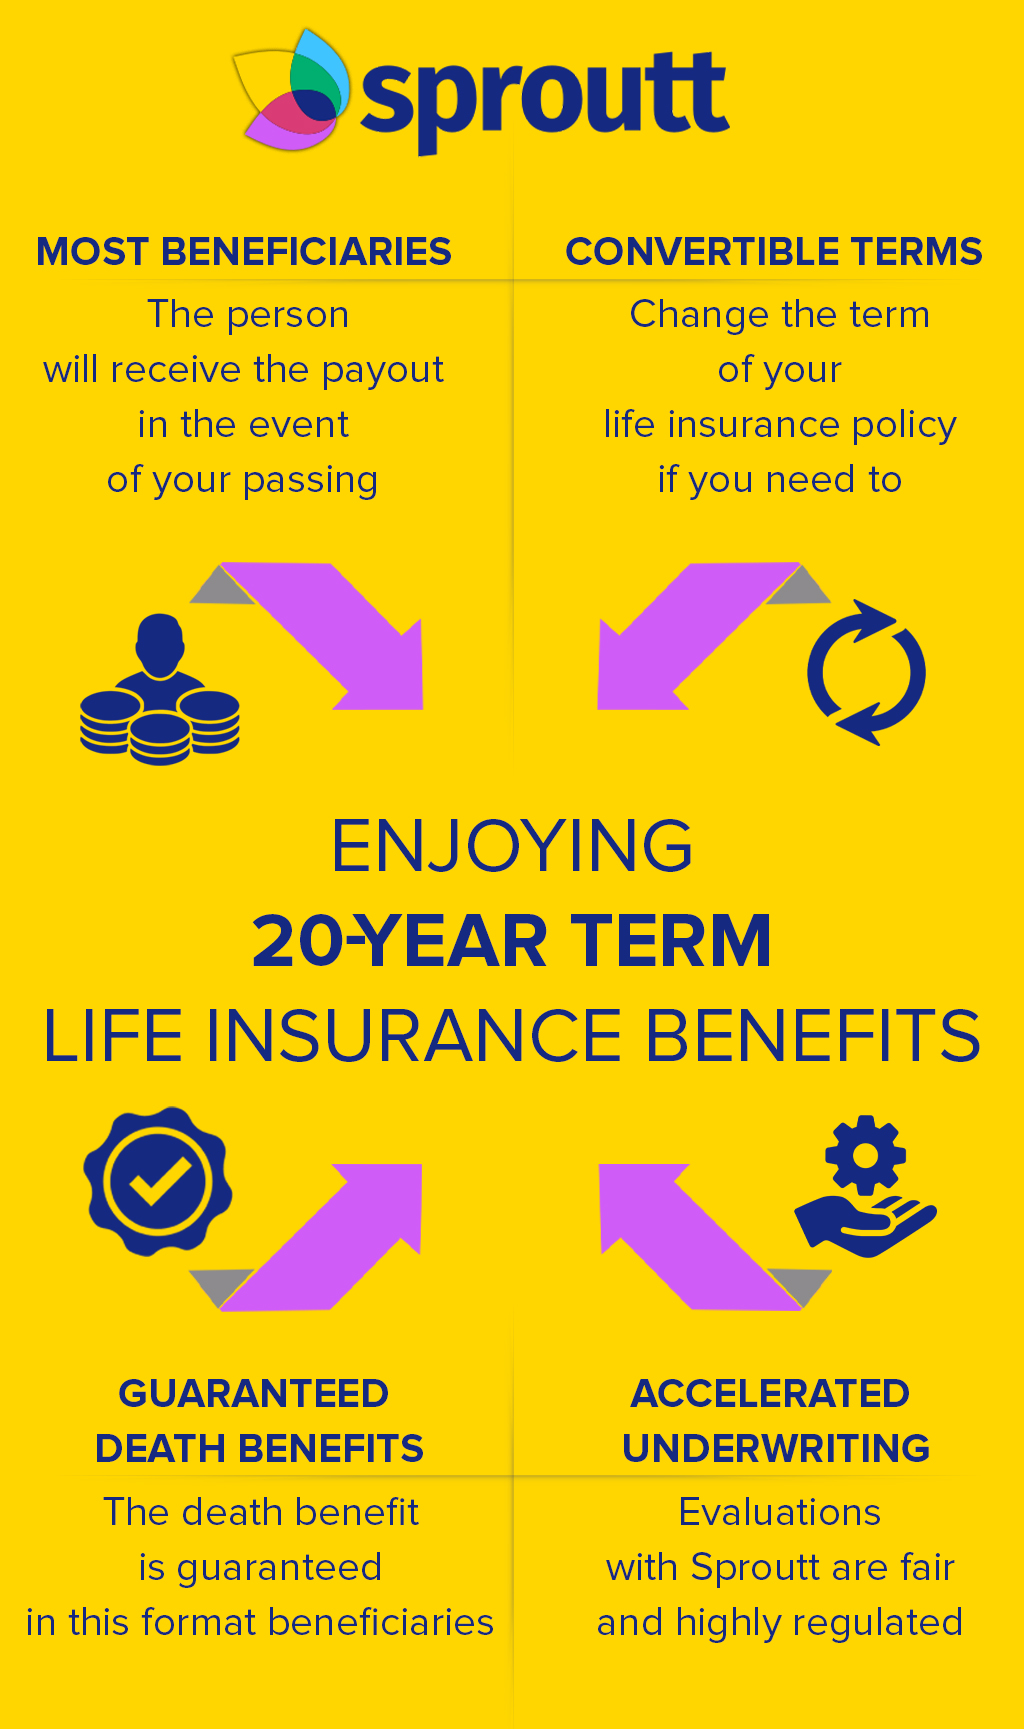 Infographic enjoying 20 year term life insurance benefits